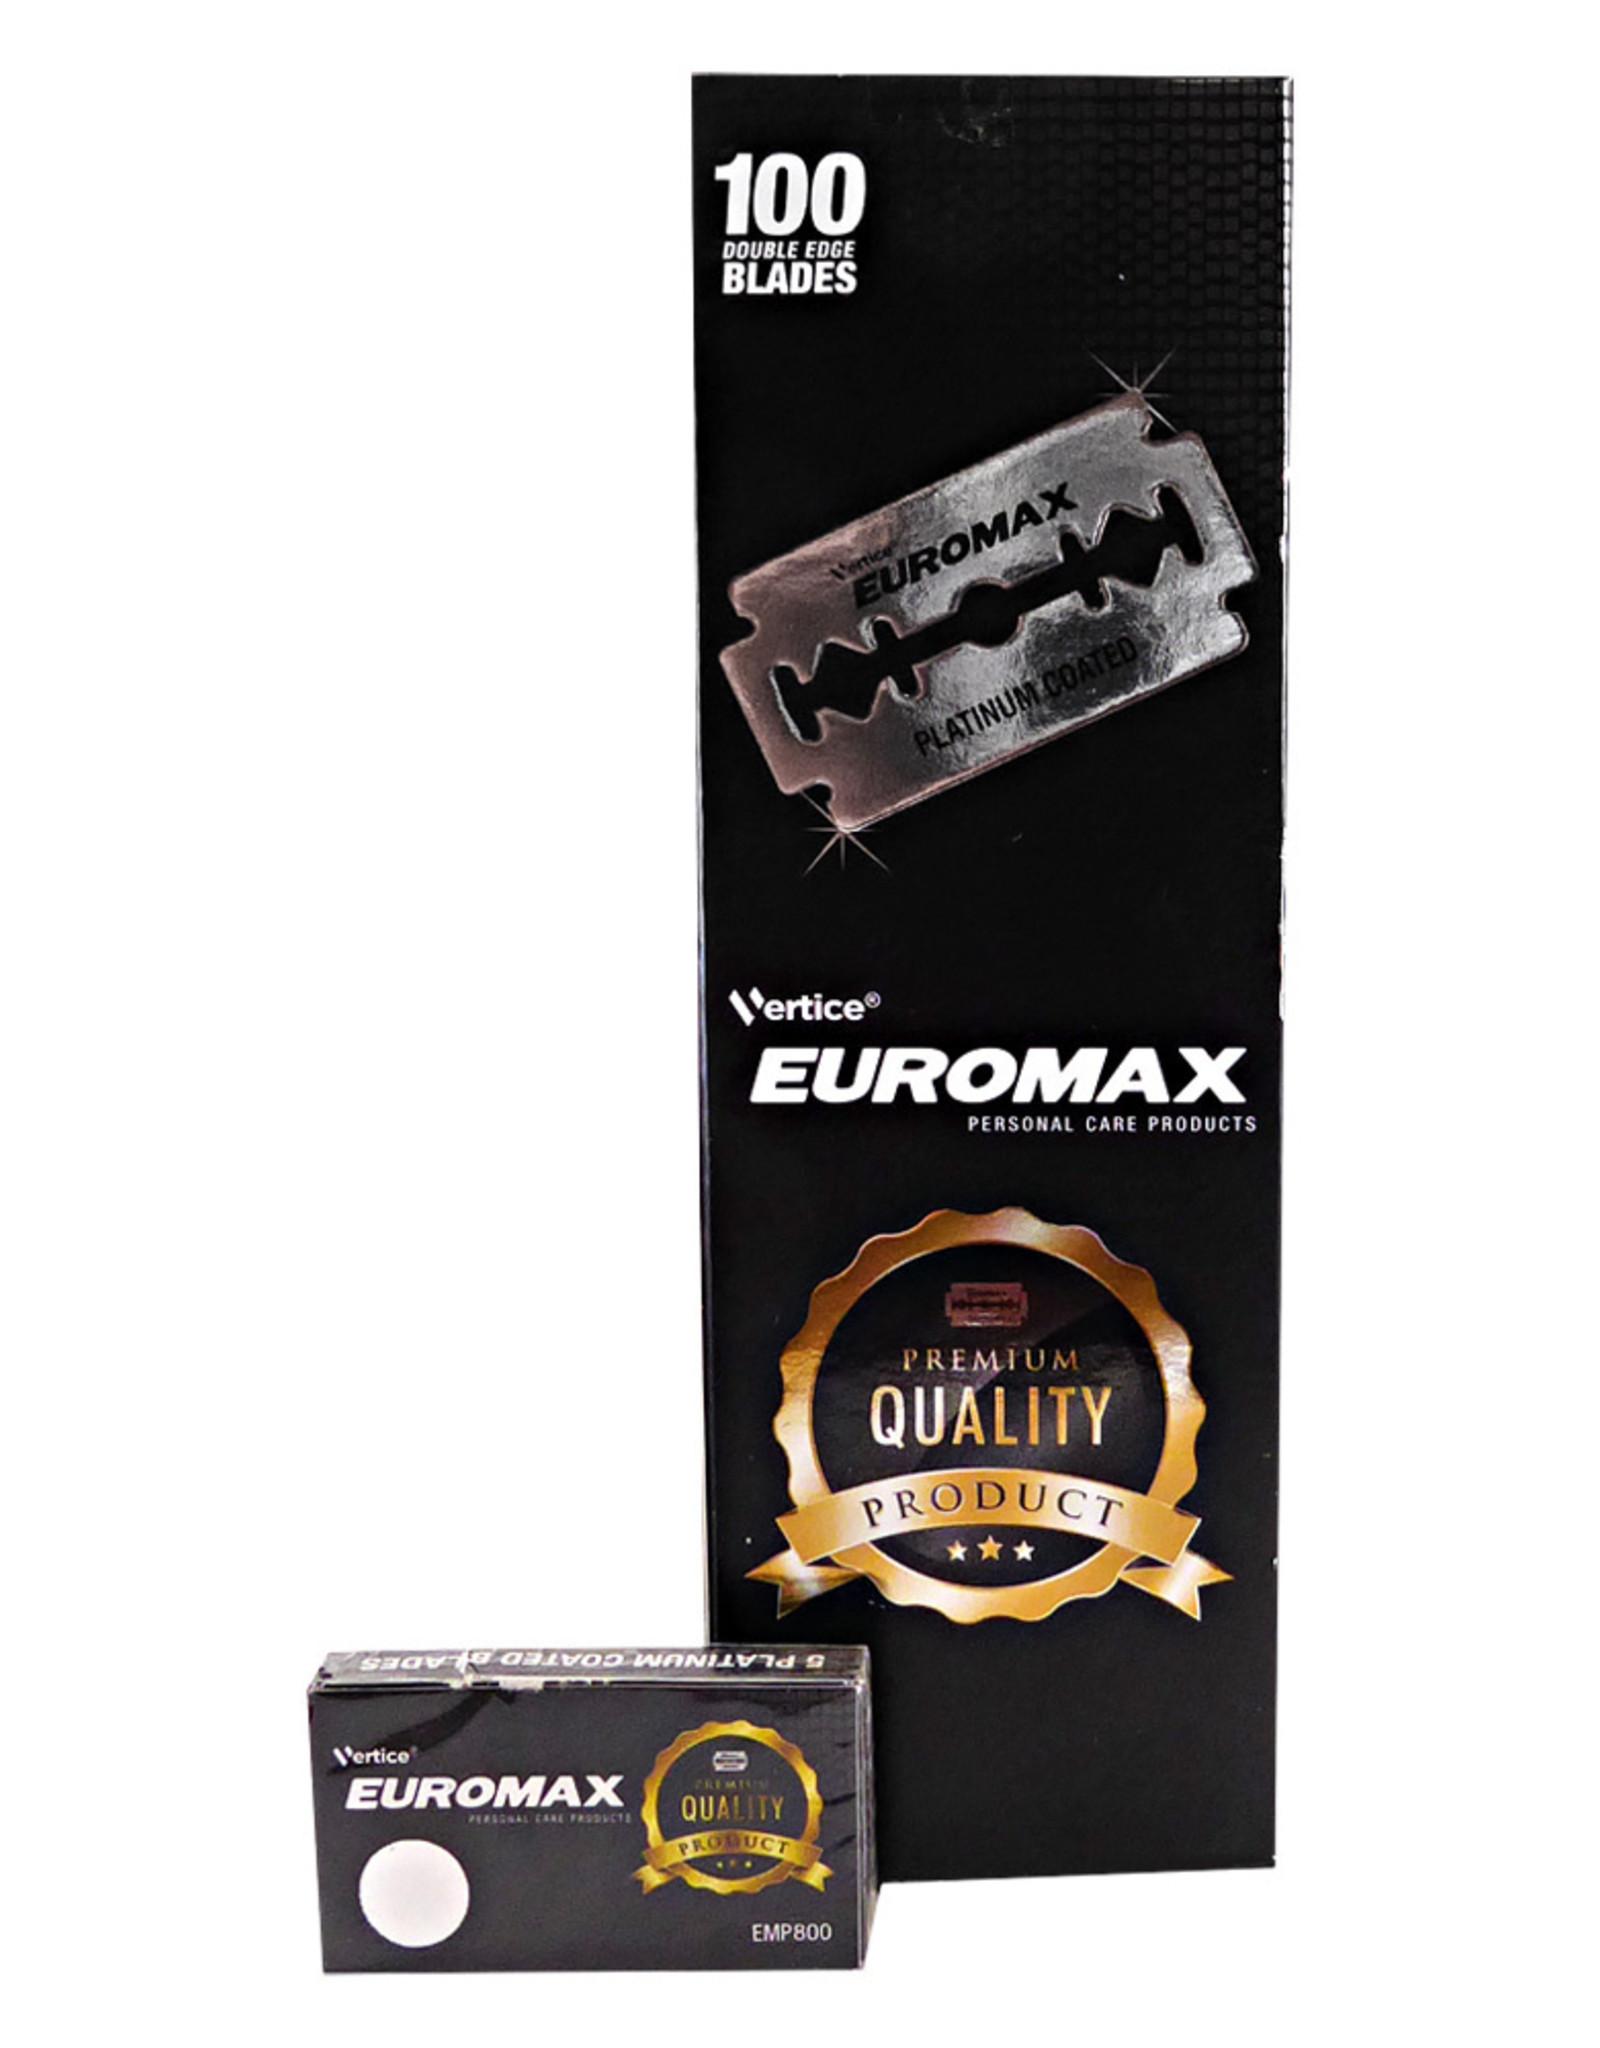 Euromax Scheermes